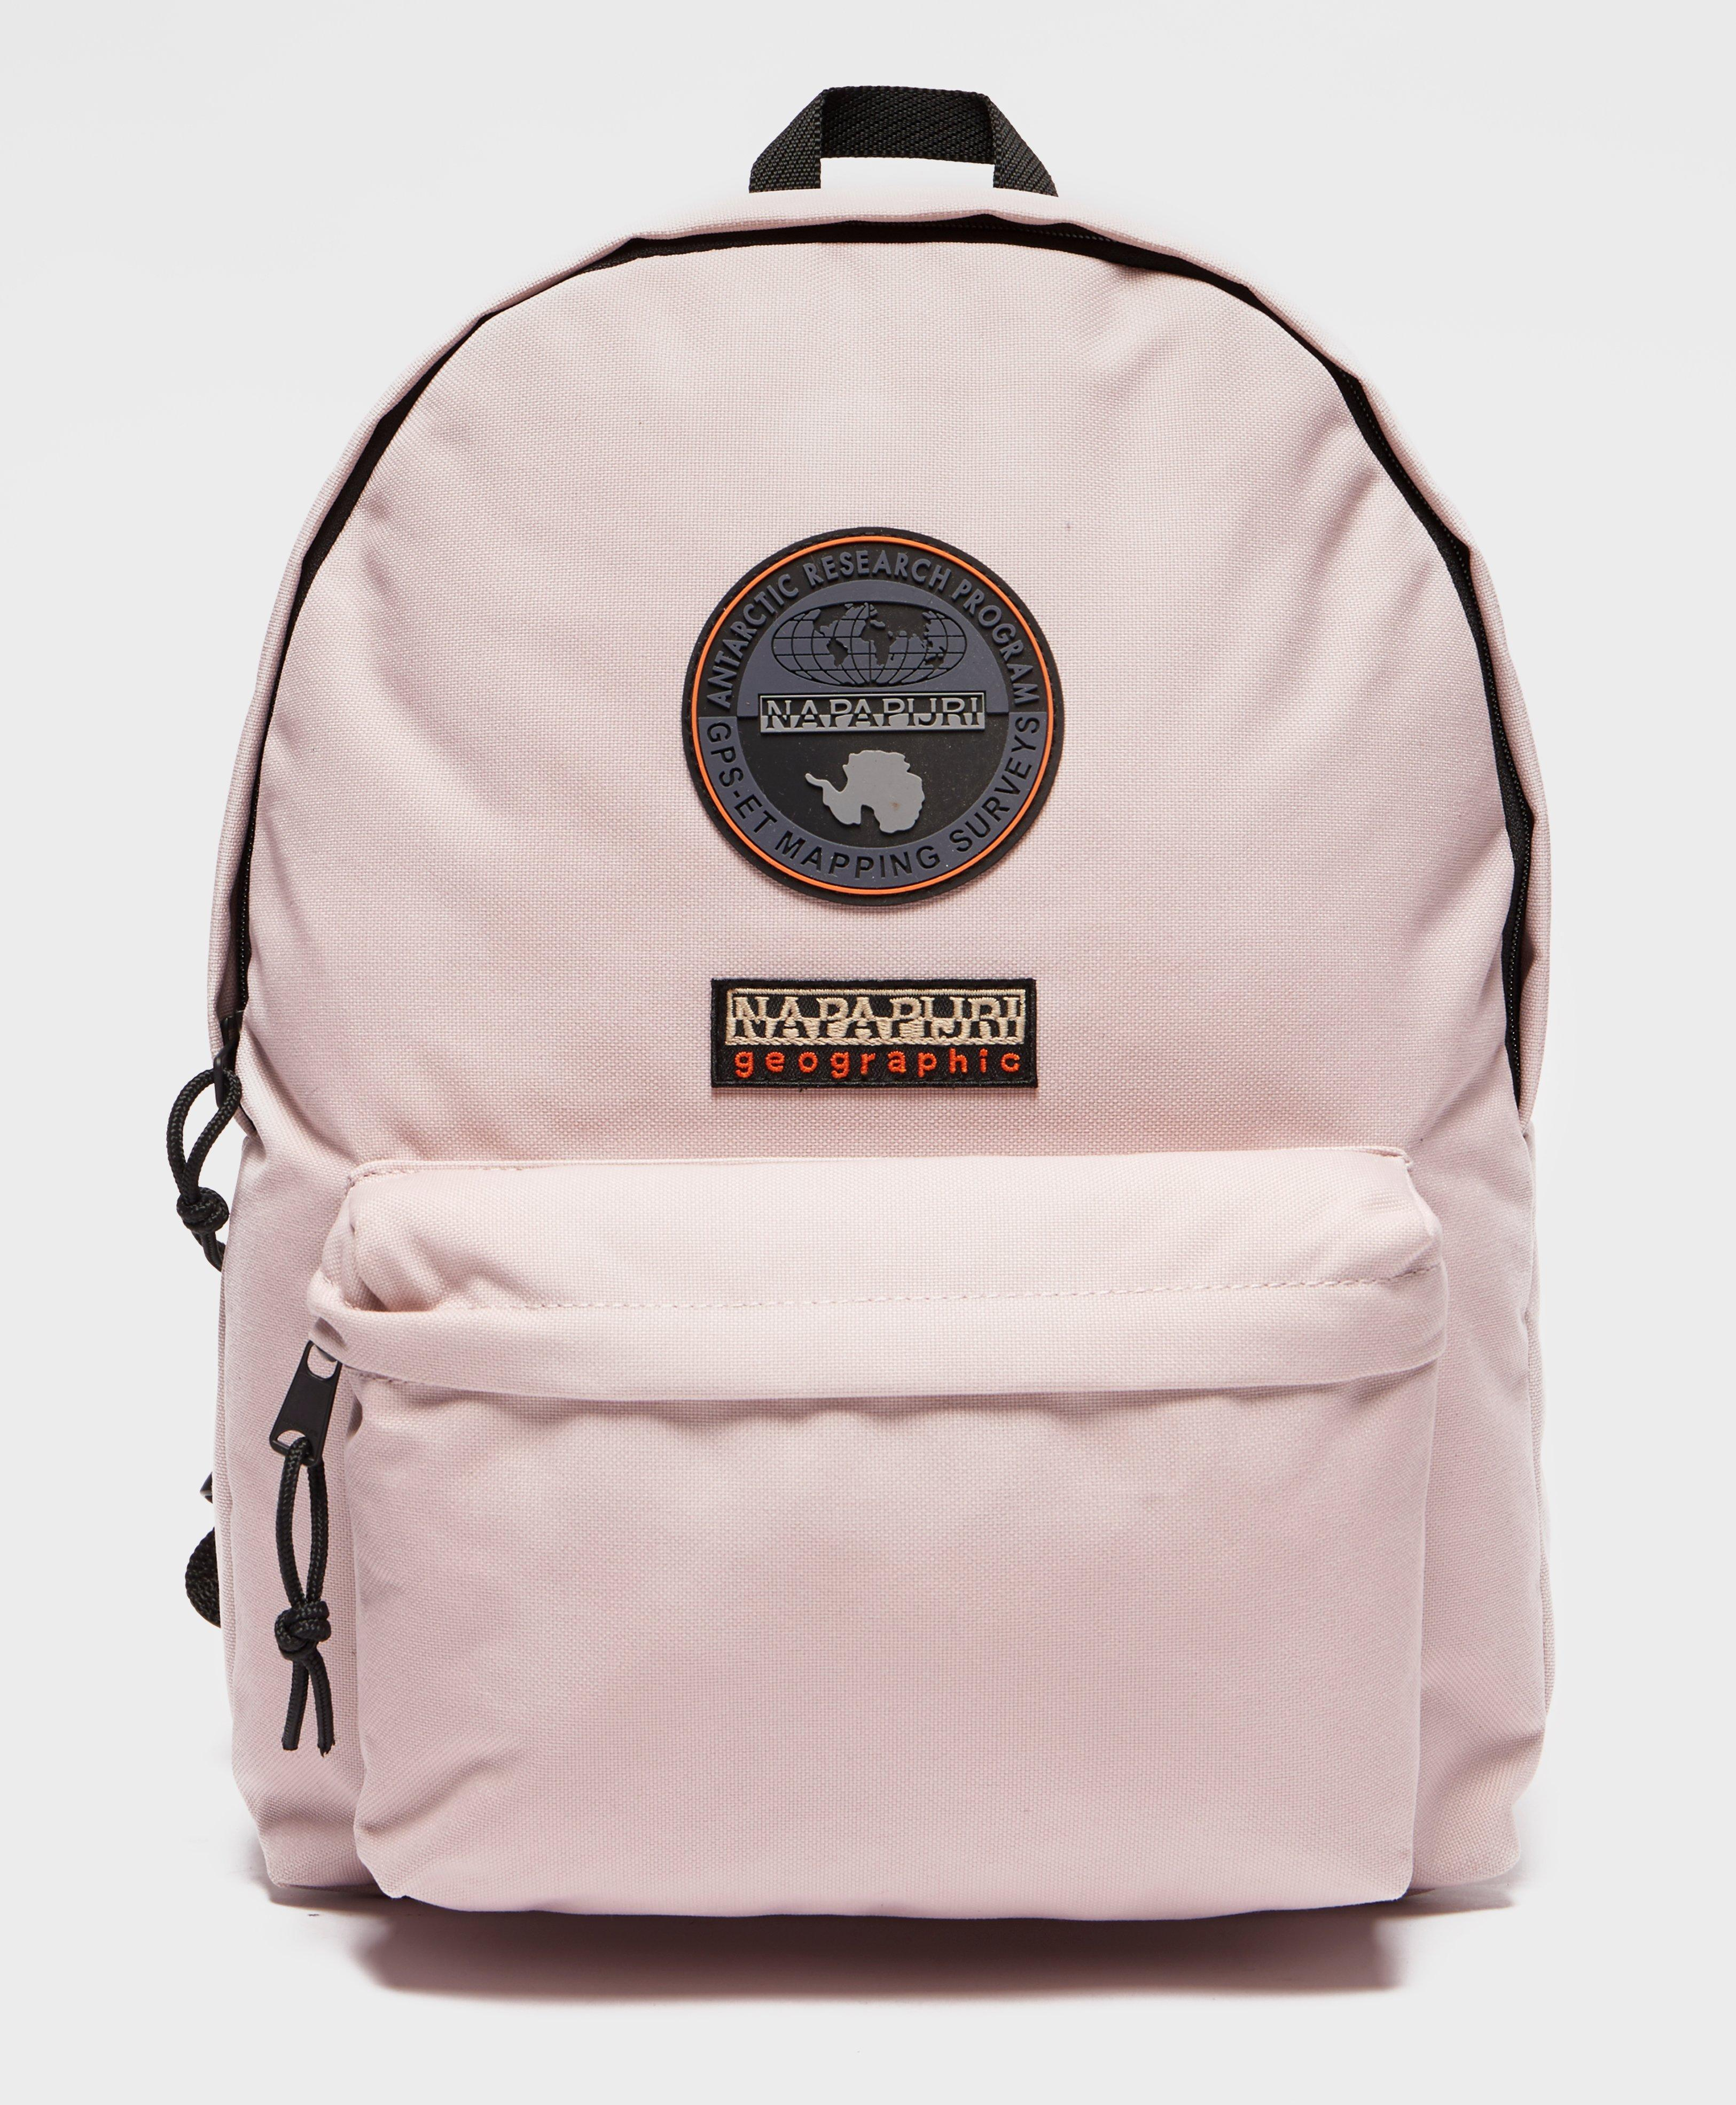 6b671fabebe Mens Blue Adicolor Backpack  designer fashion 0dee9 dcf7a Napapijri Voyage  Backpack for Men - Lyst  more photos 05c16 bd20f Adidas - Originals ...